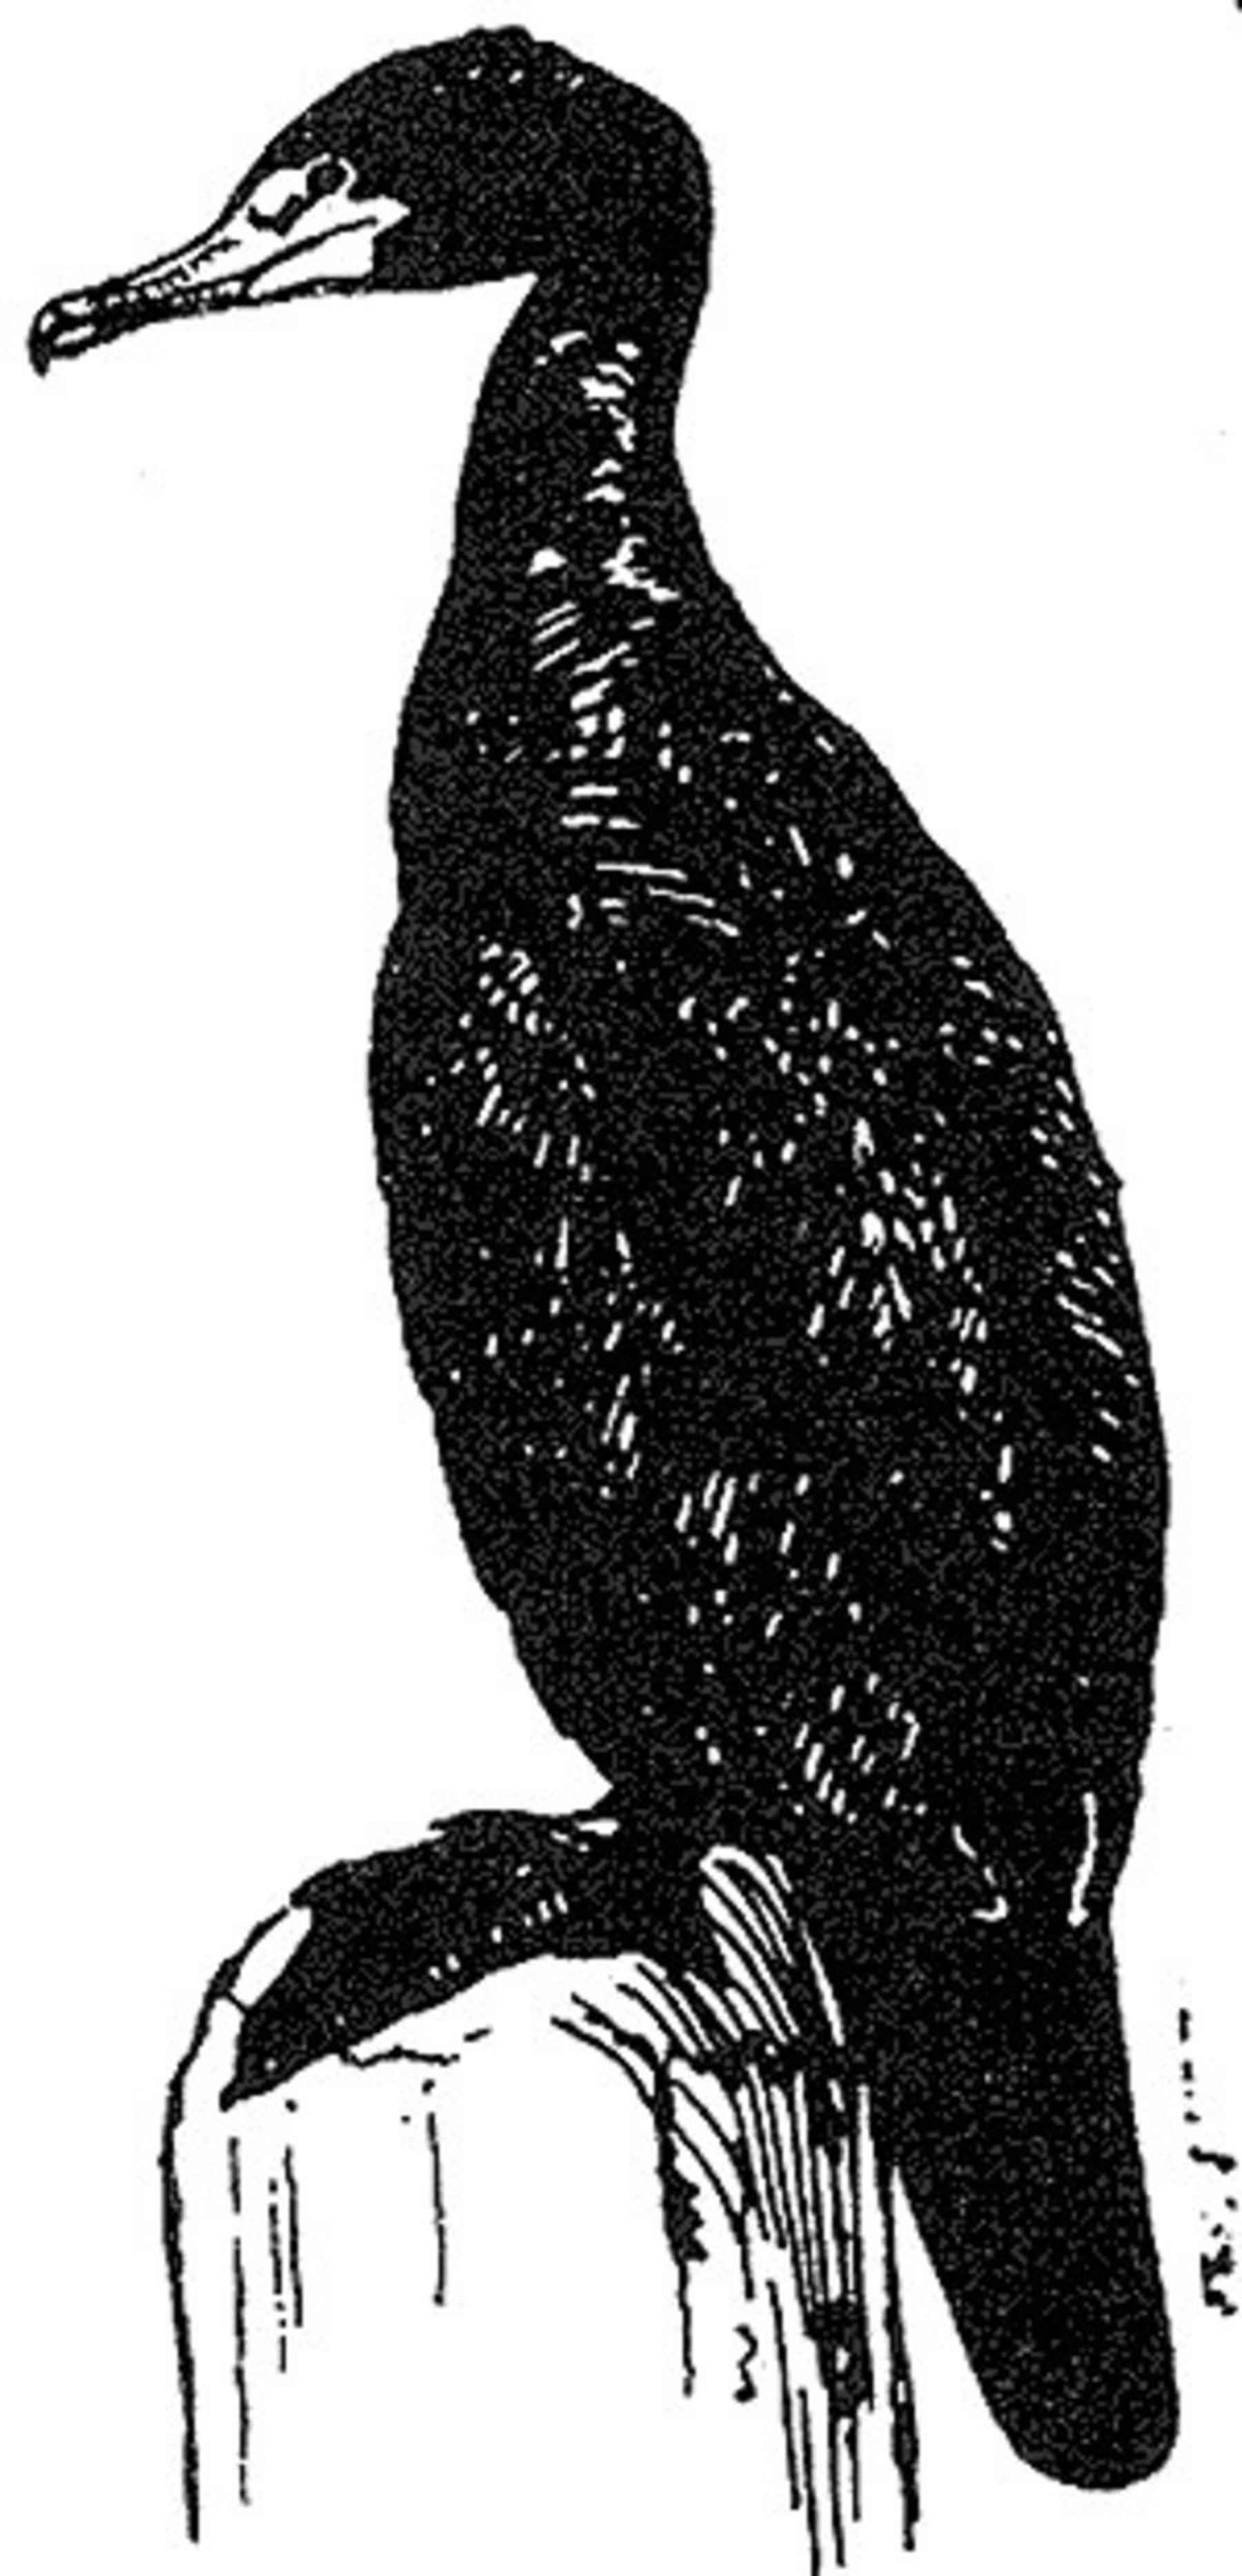 Black And White Line Art : File black and white line art of cormorant bird g